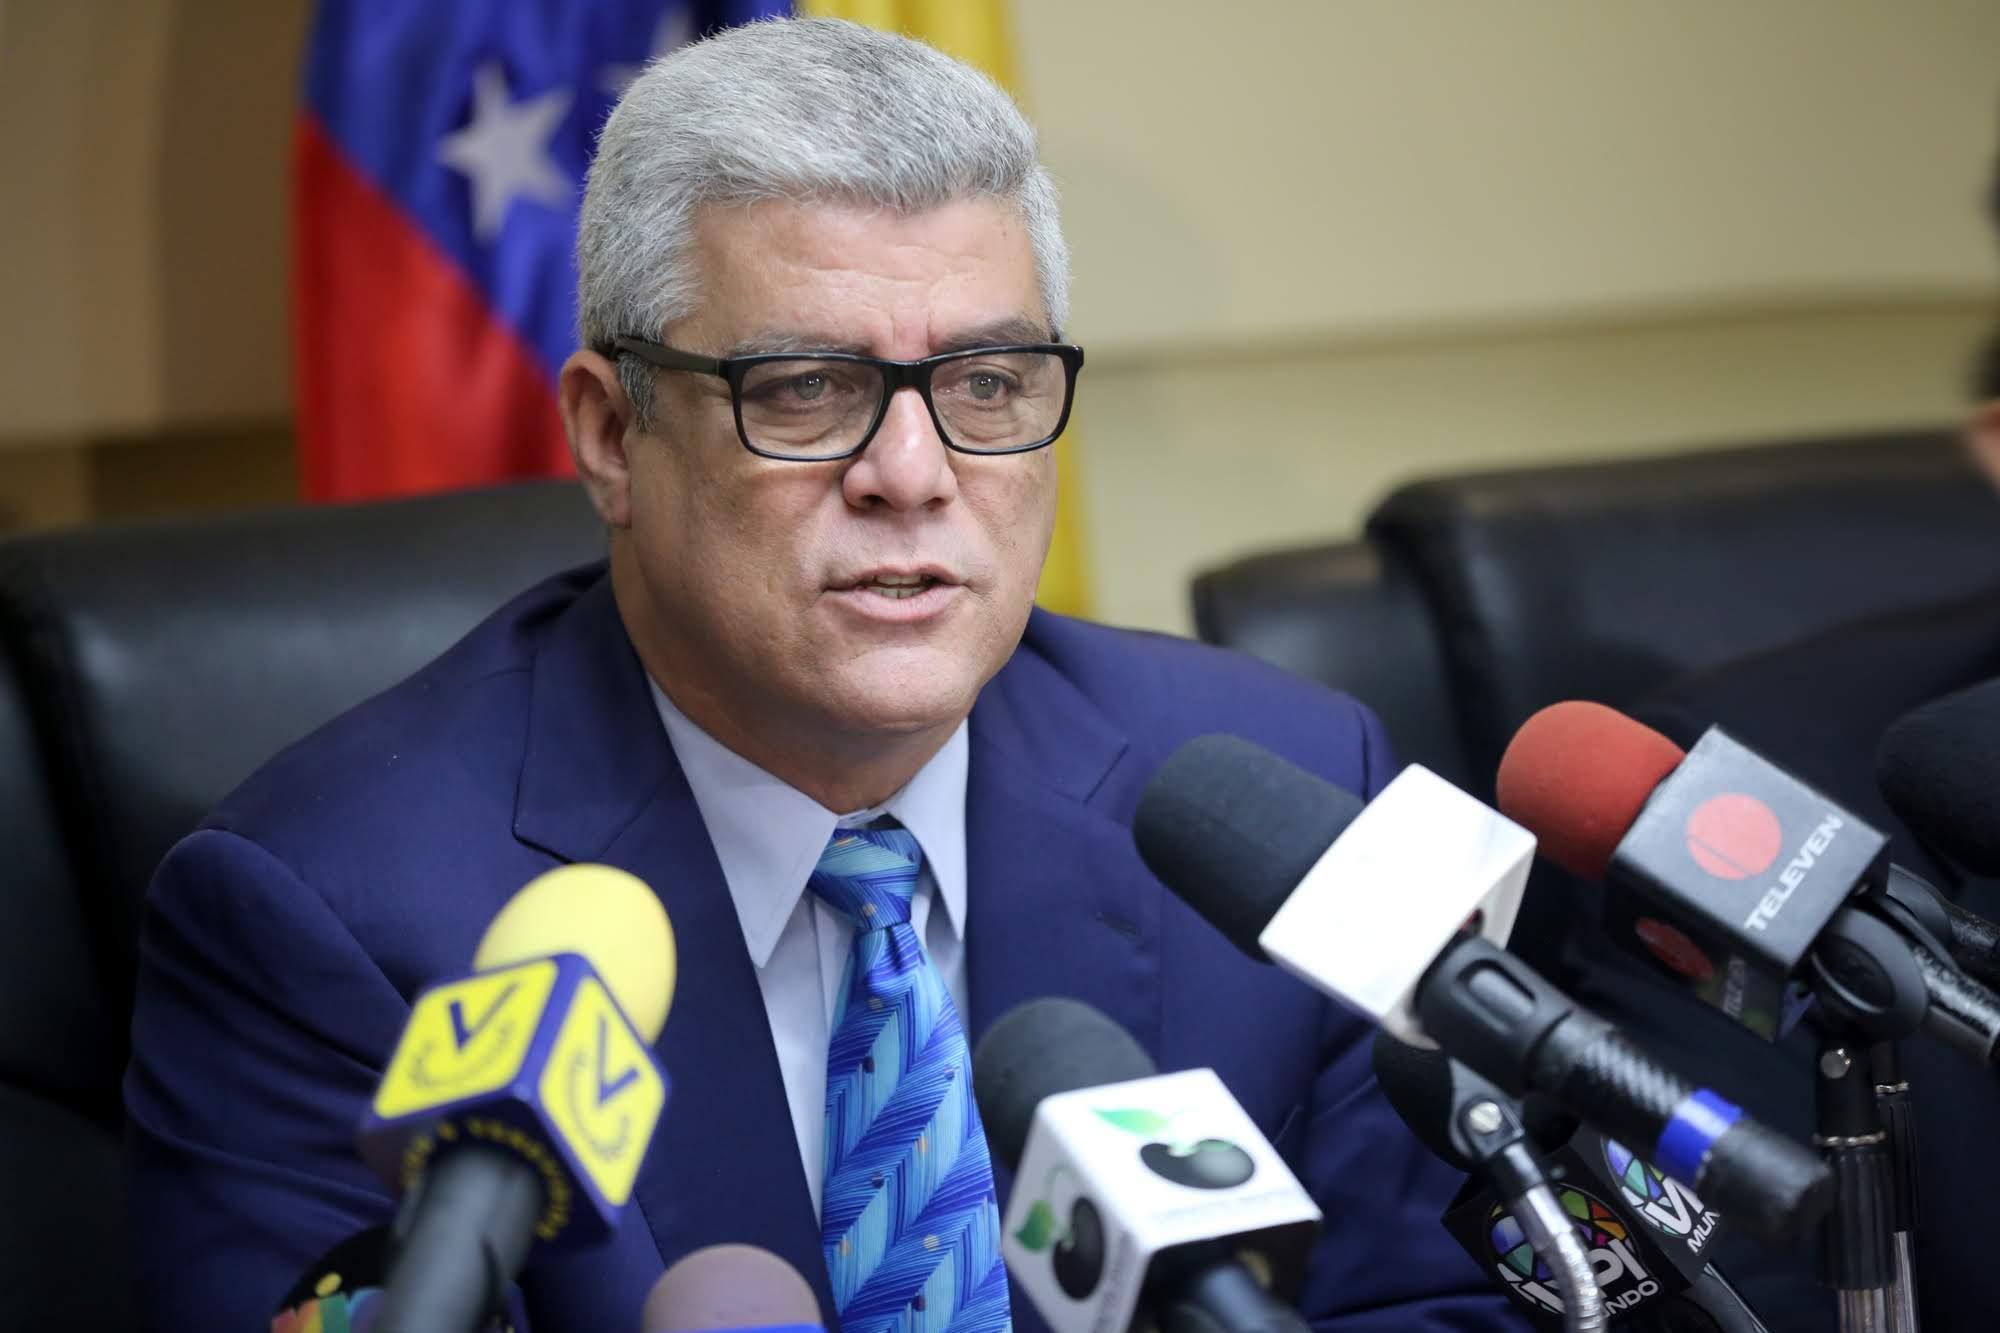 Inflación anual récord en Venezuela de 46.305%